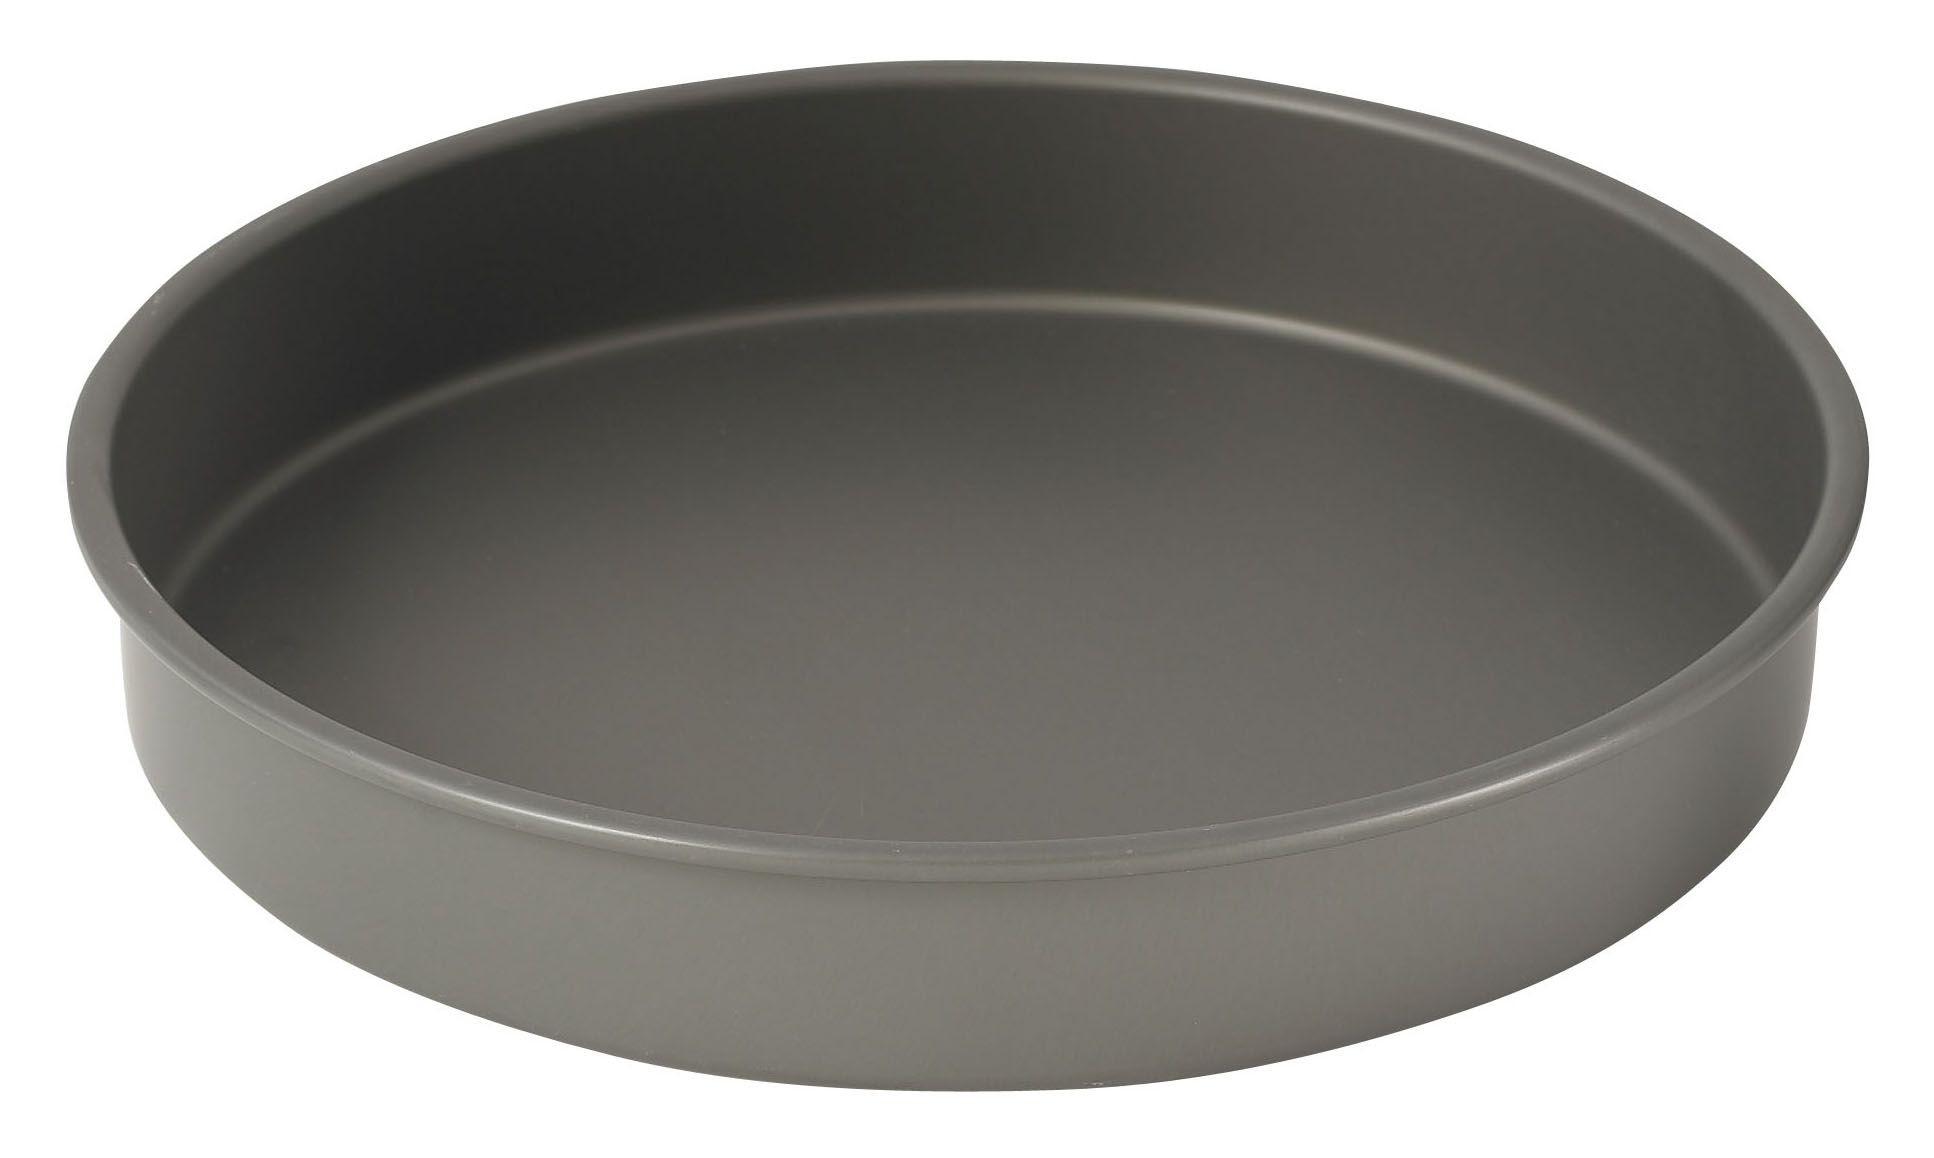 "Winco HAC-122 Hard Anodized Aluminum Cake Pan, 12"" Dia x 2"" H"